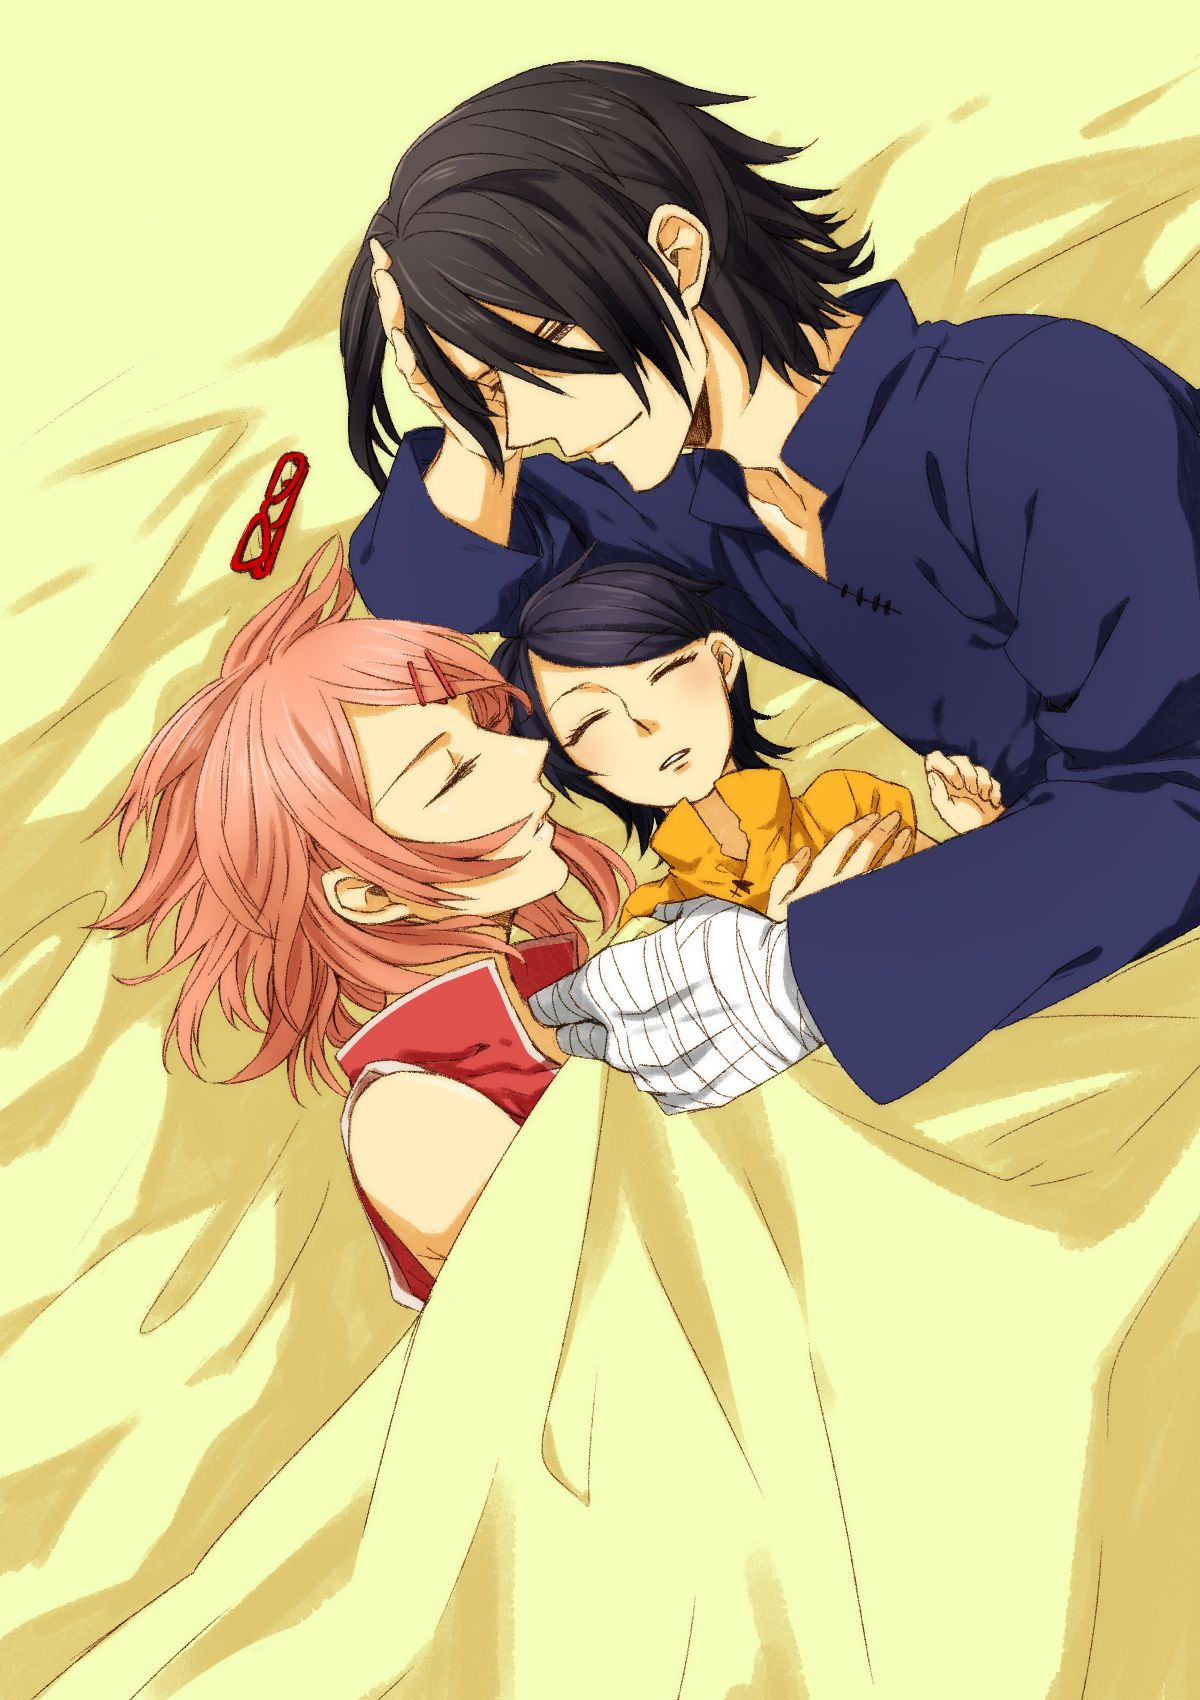 Top Wallpaper Naruto Couple - 452e95beb510f6c768a3acc22f0b90bb  Pic_803376.jpg